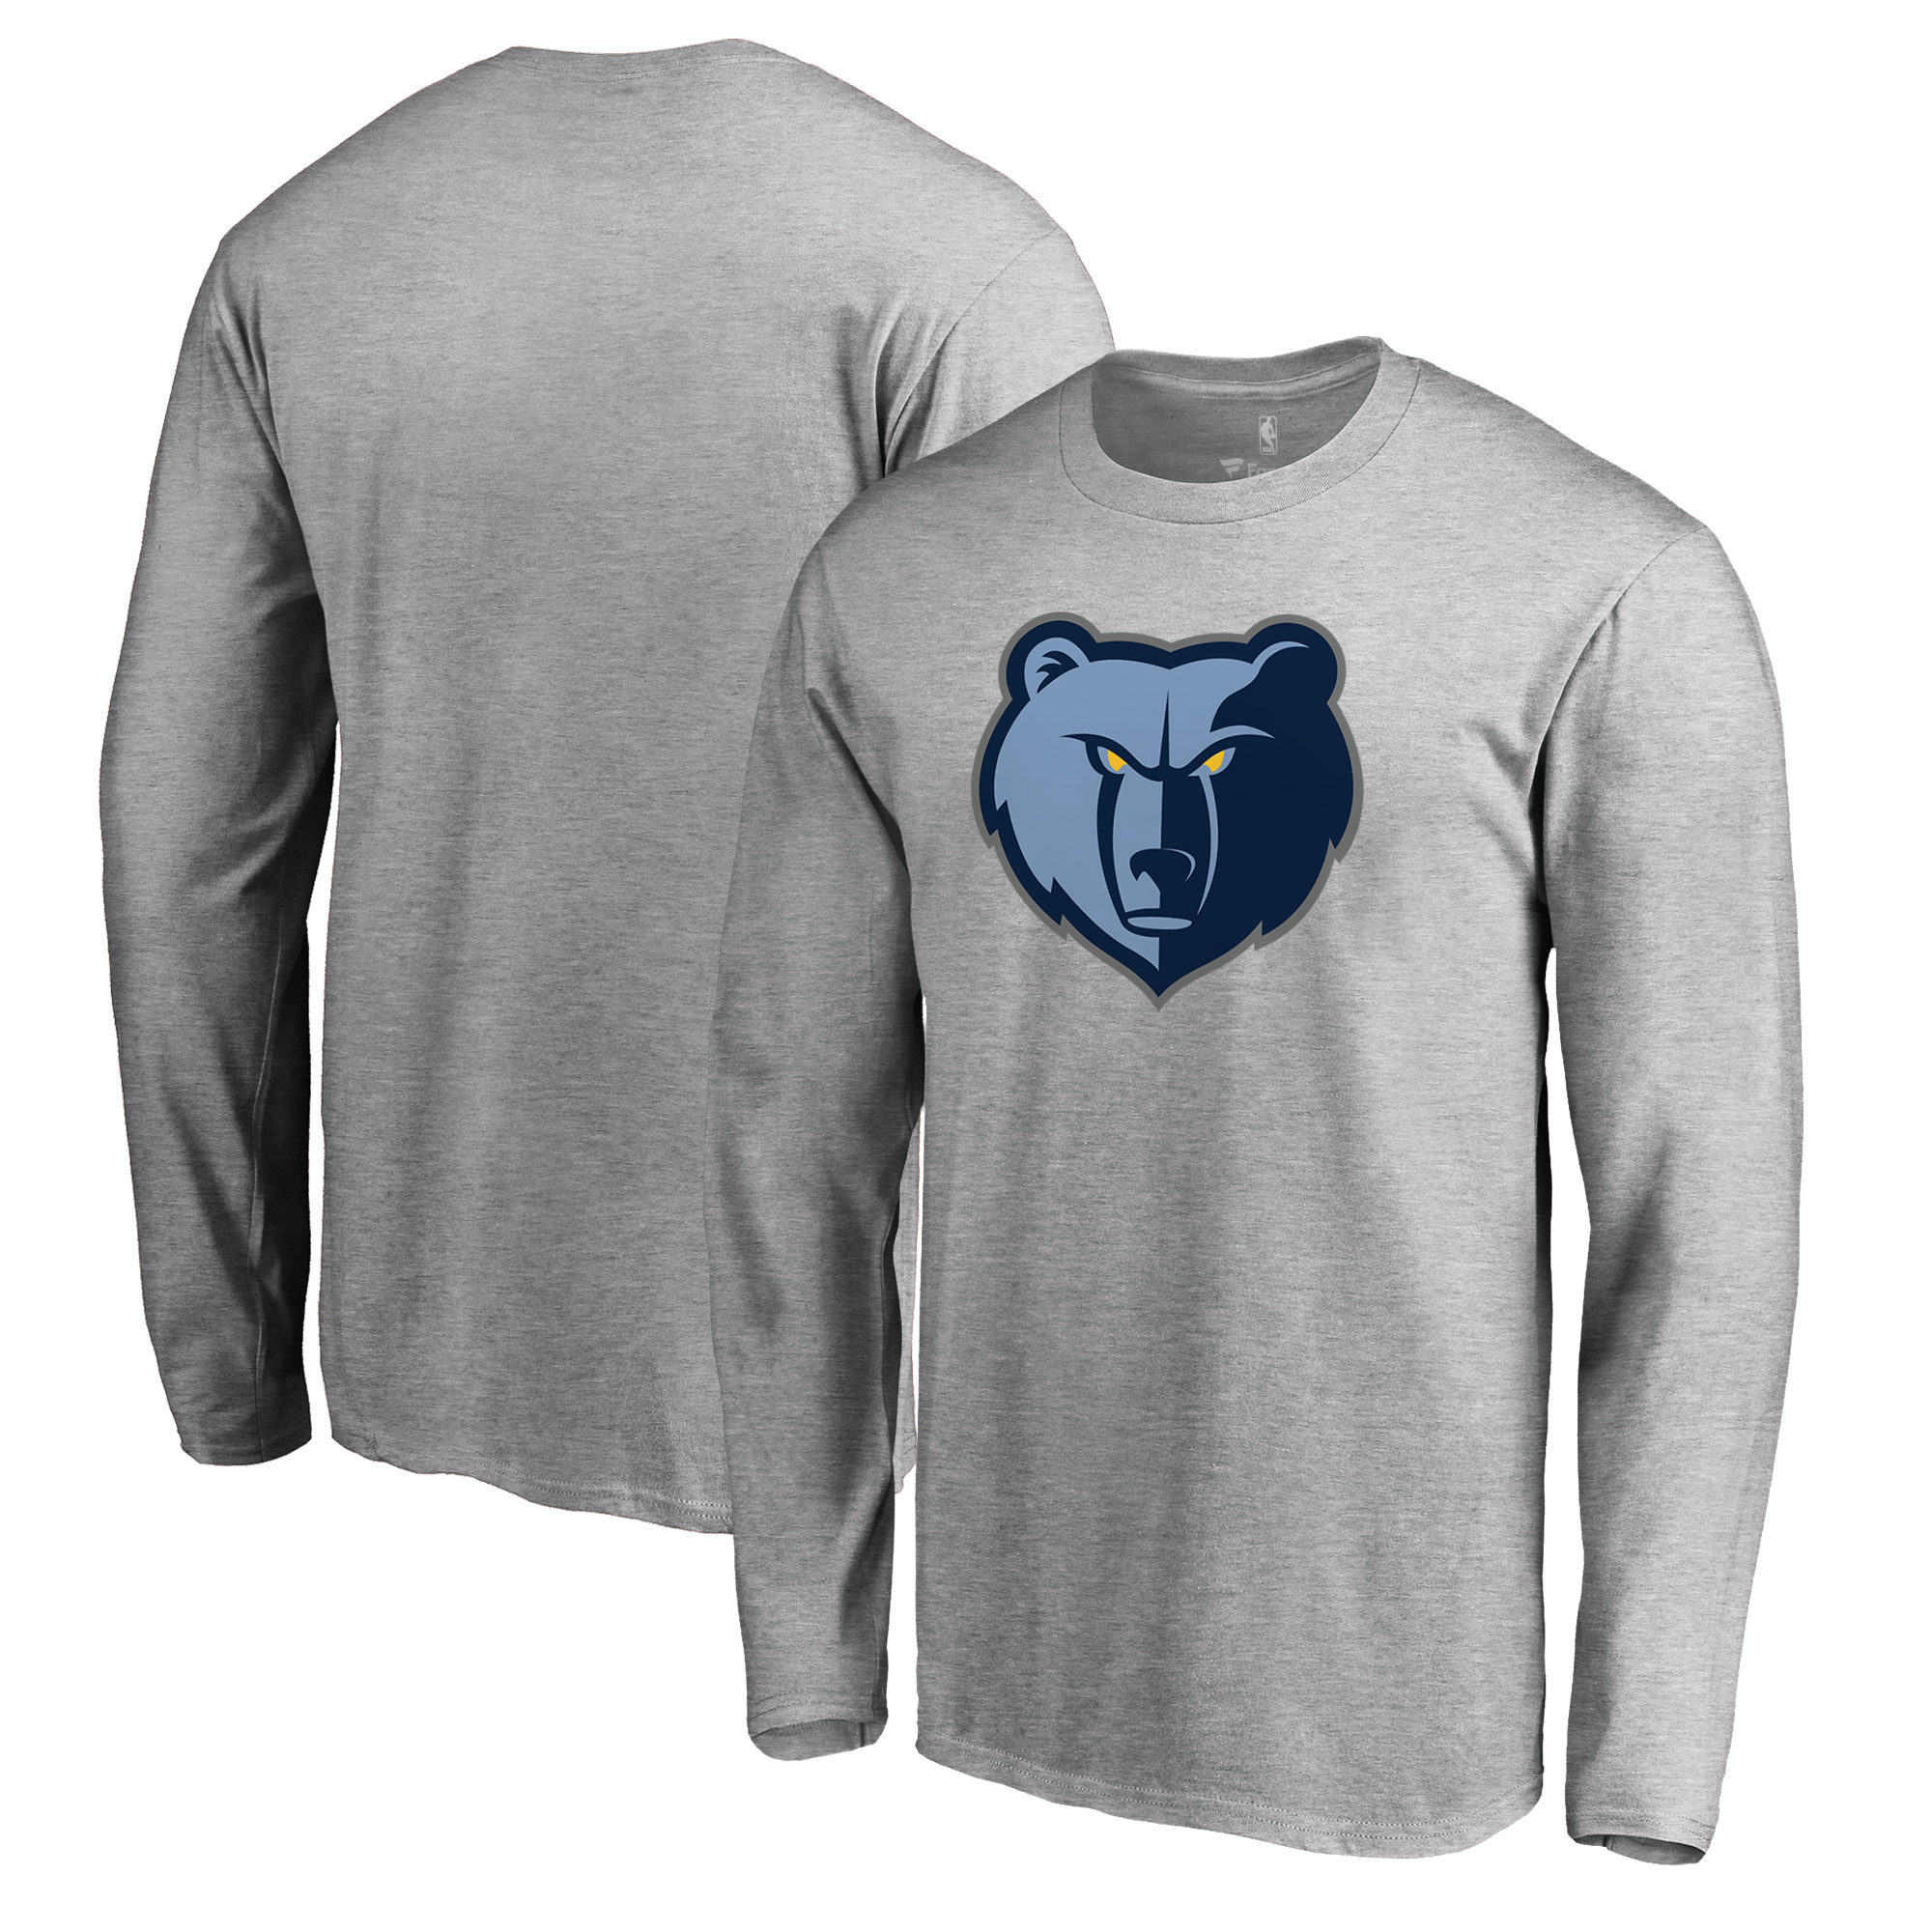 Memphis Grizzlies Fanatics Branded Primary Logo Long Sleeve T-Shirt - Heather Gray